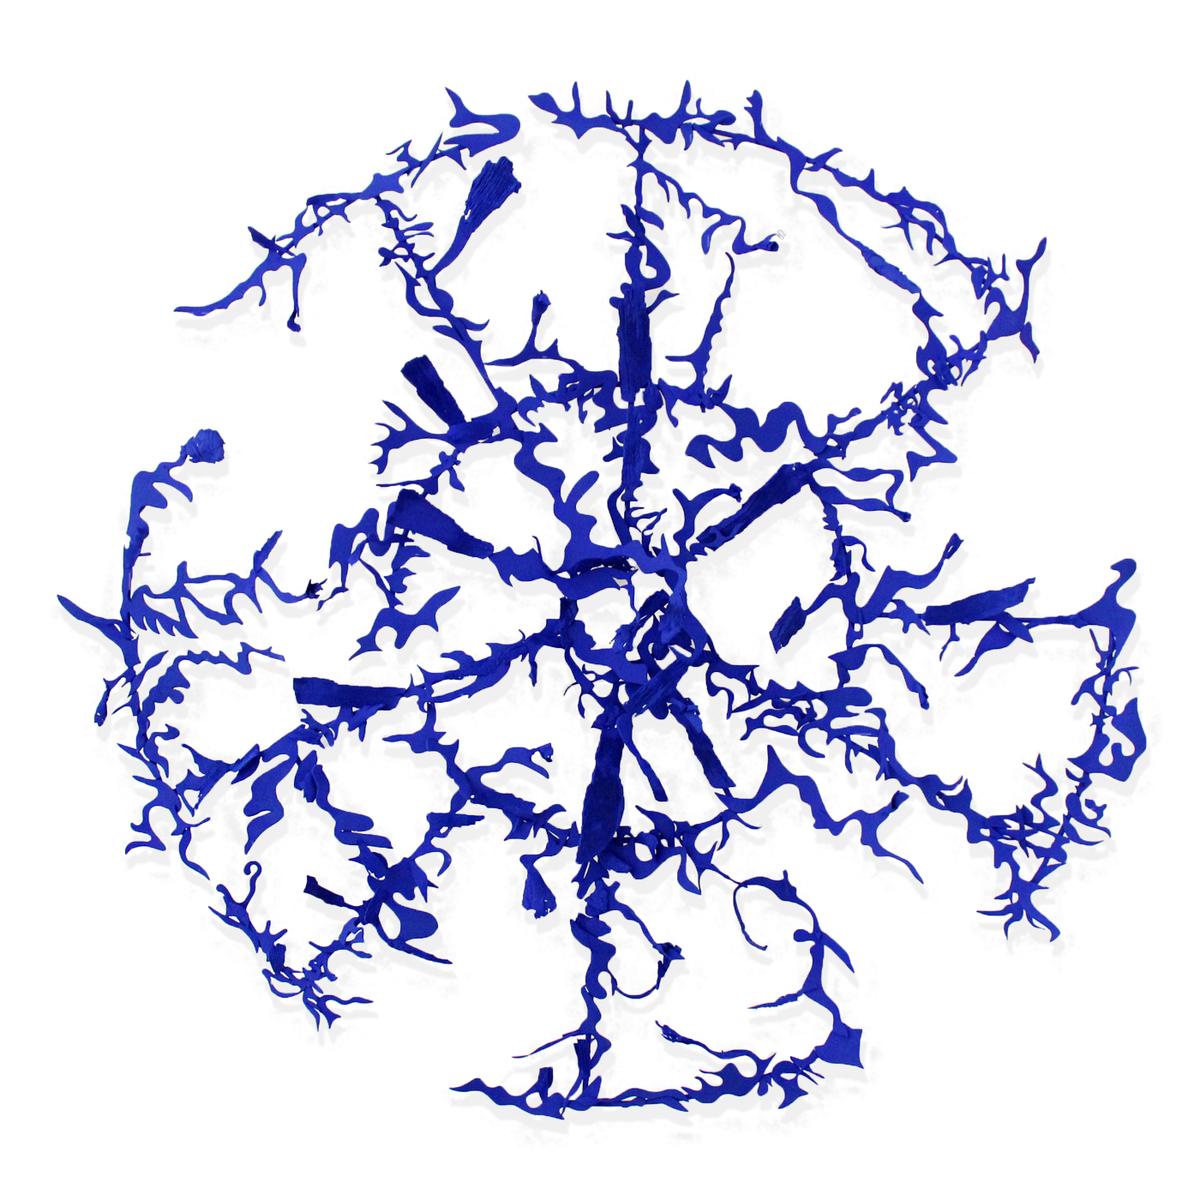 Arabella Caccia - A Constellation : Ultramarine Blue